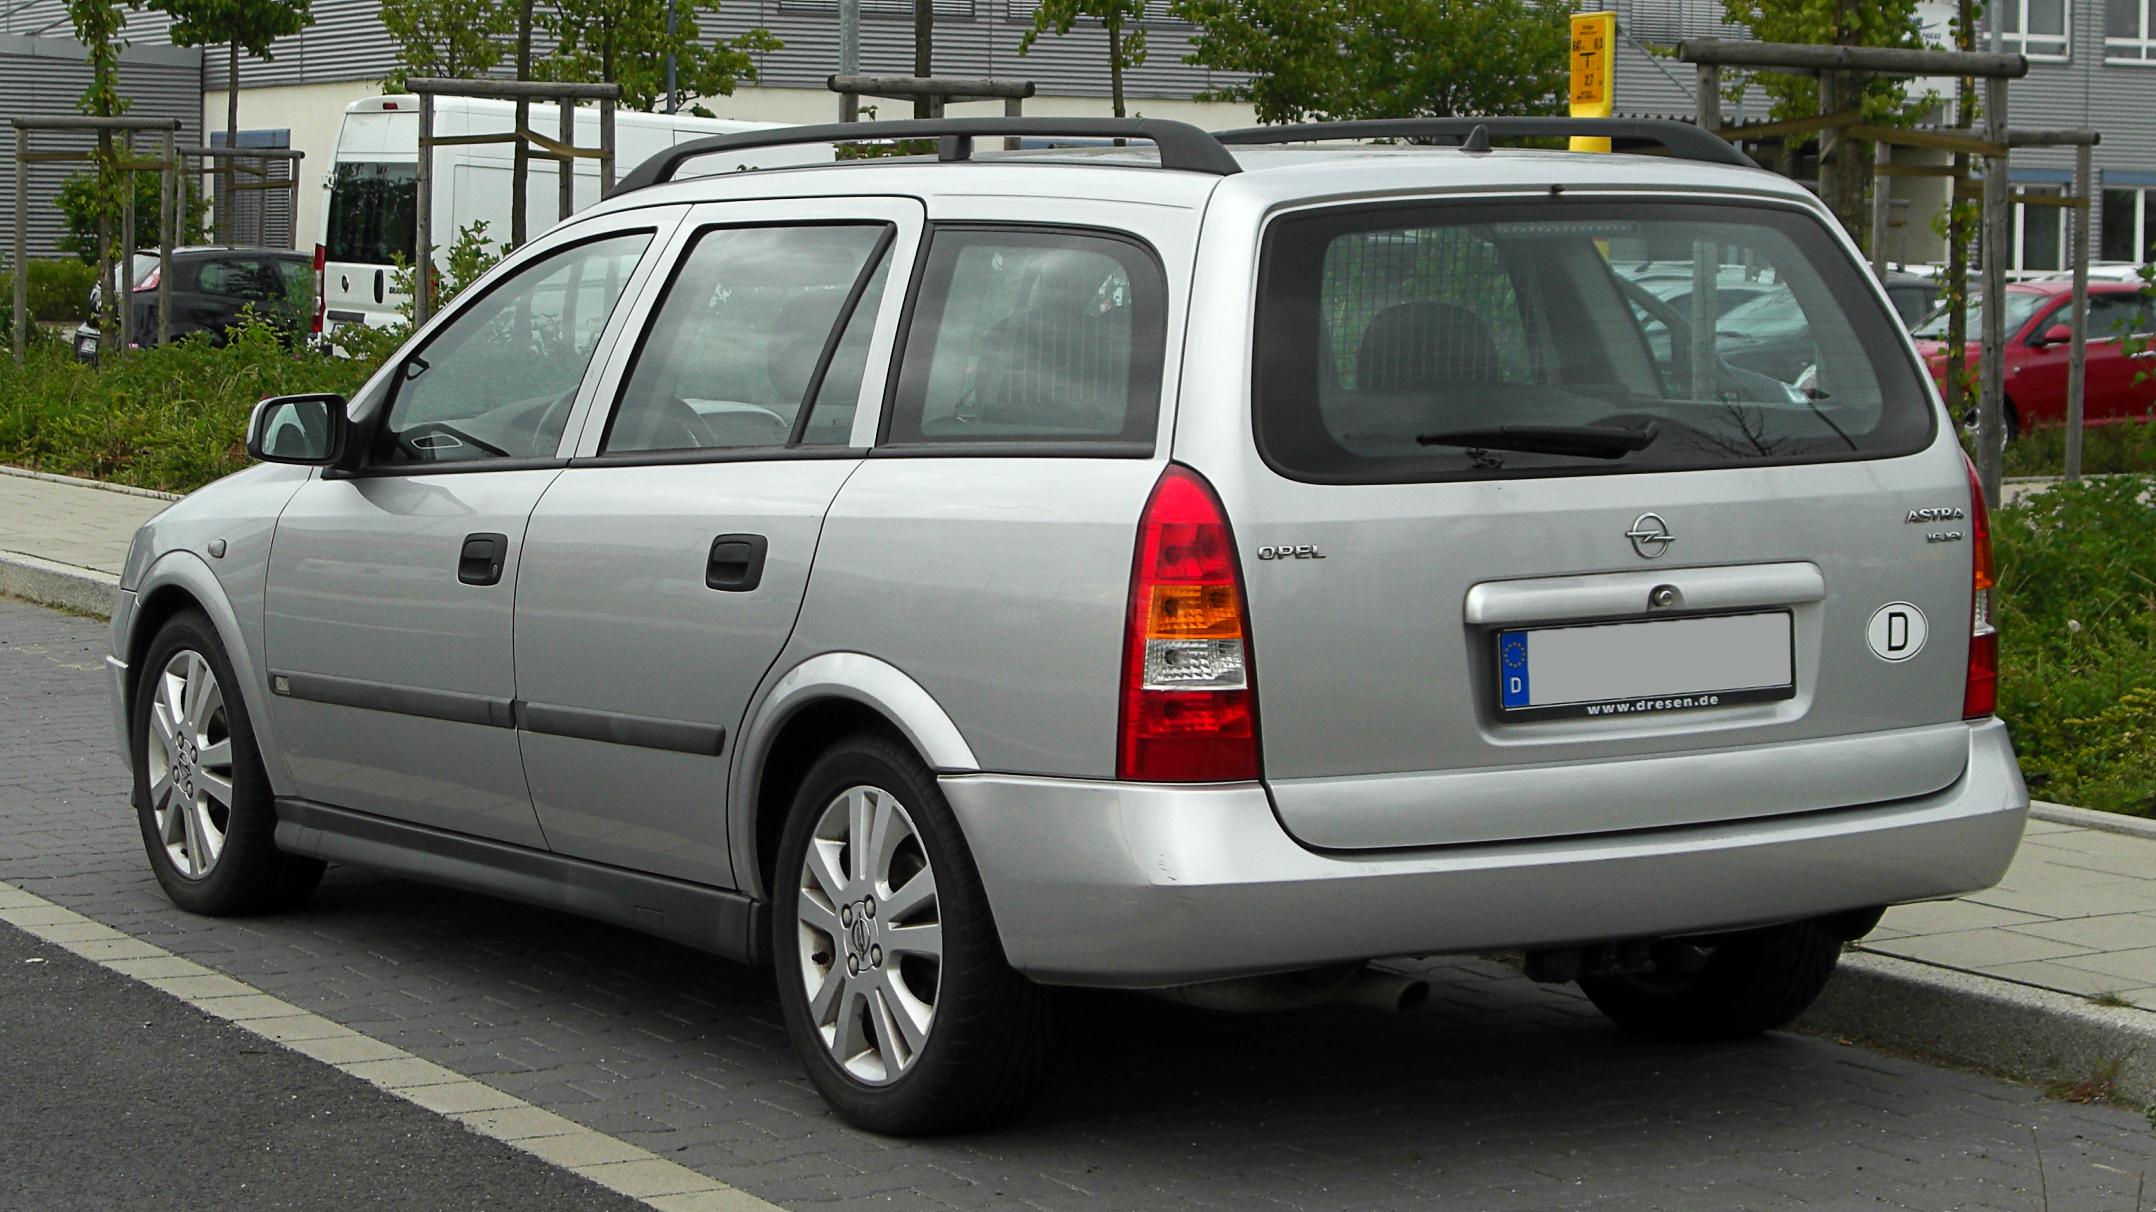 [Slika: Opel_Astra_Caravan_1.6_16V_Selection_%28...eldorf.jpg]